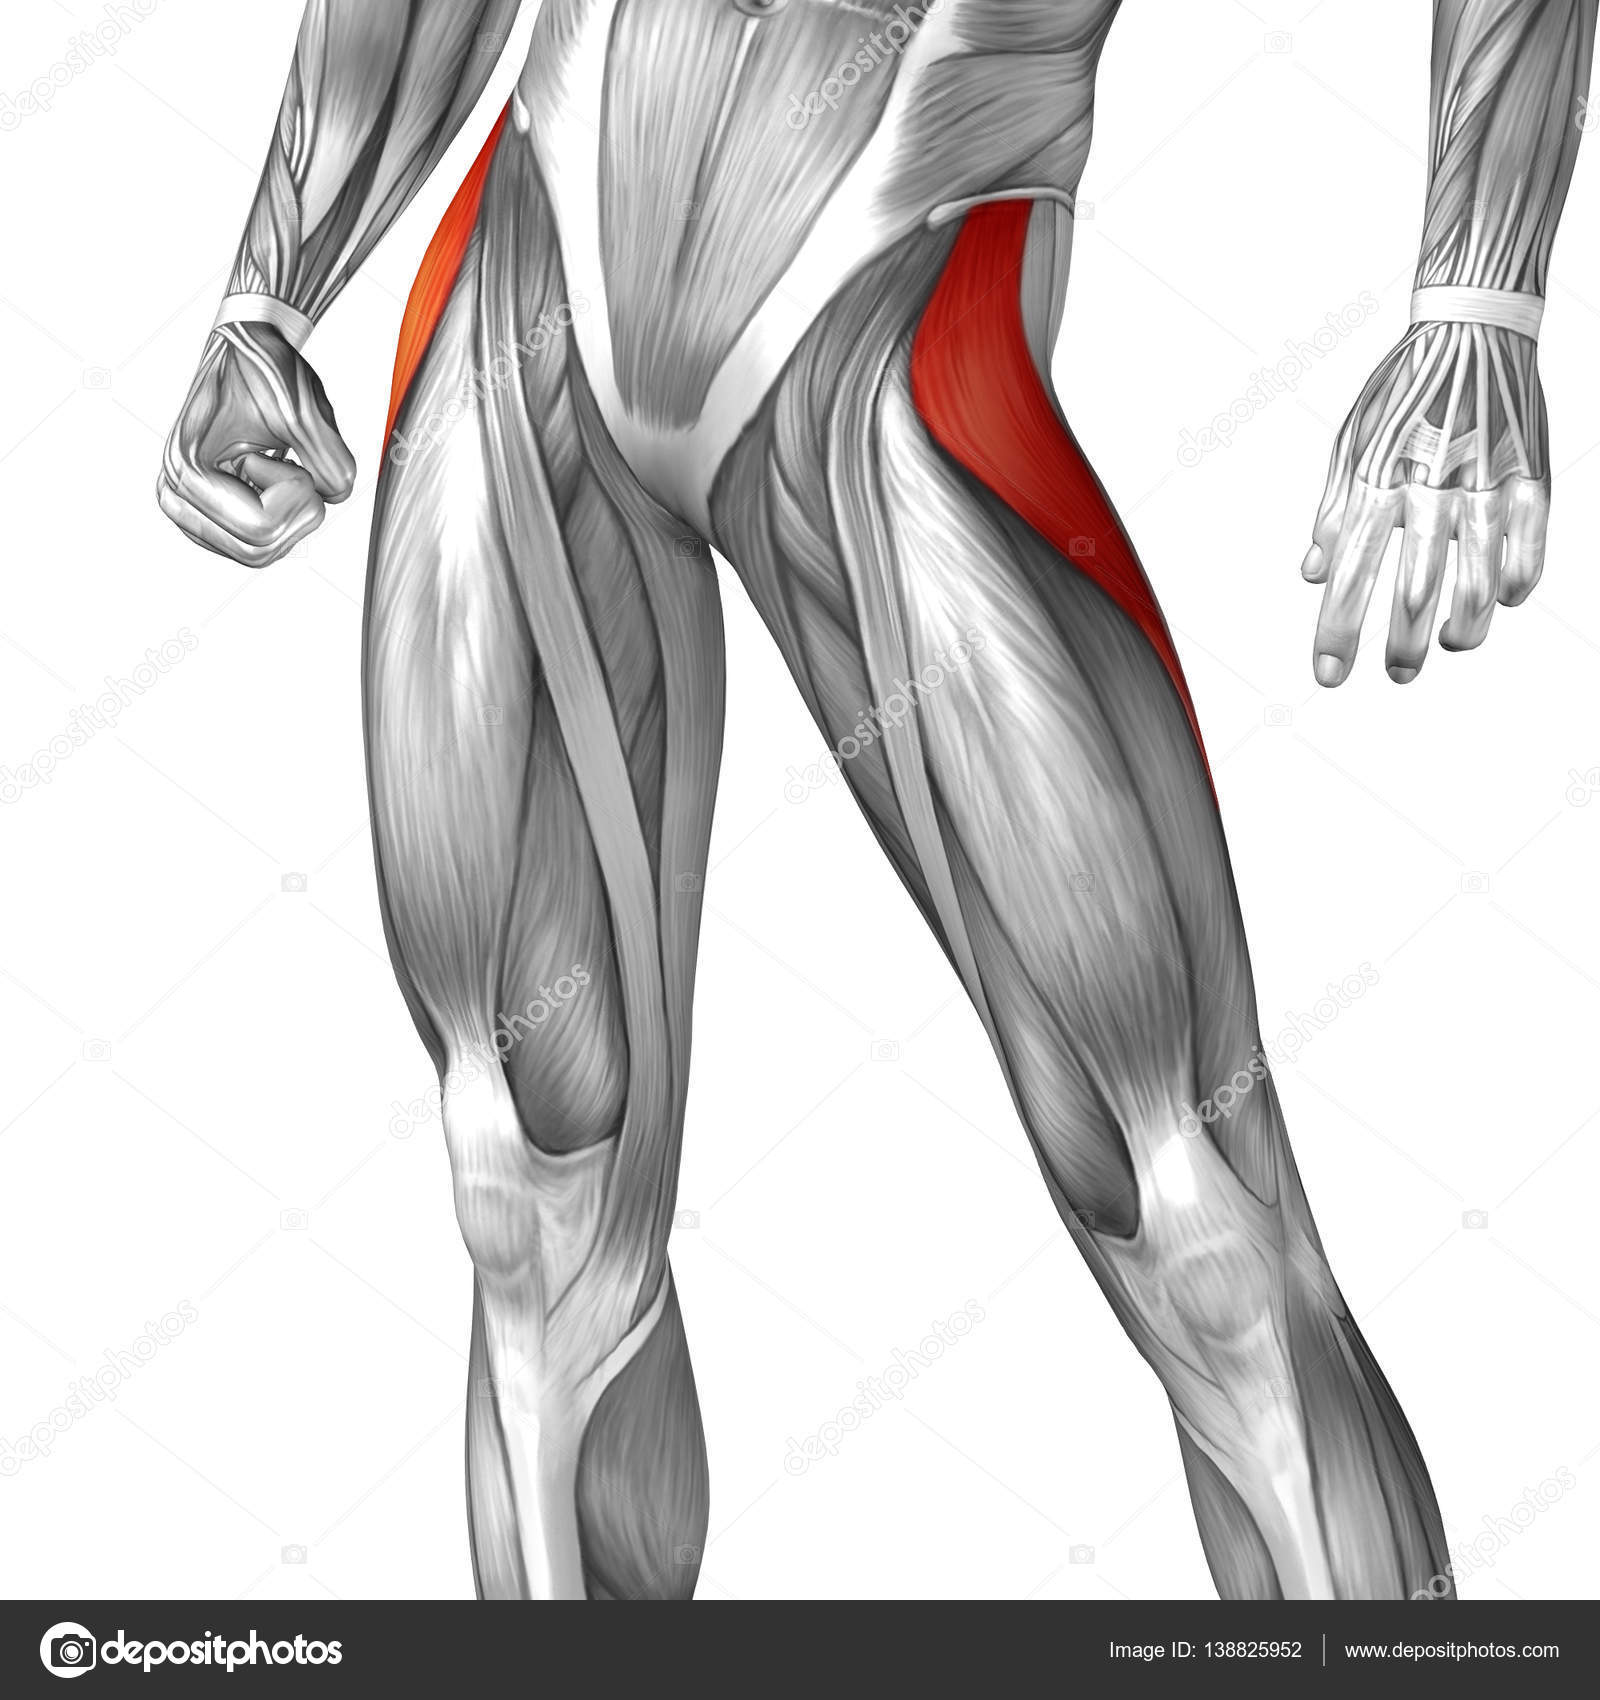 Human Upper Leg Anatomy Stock Photo Design36 138825952